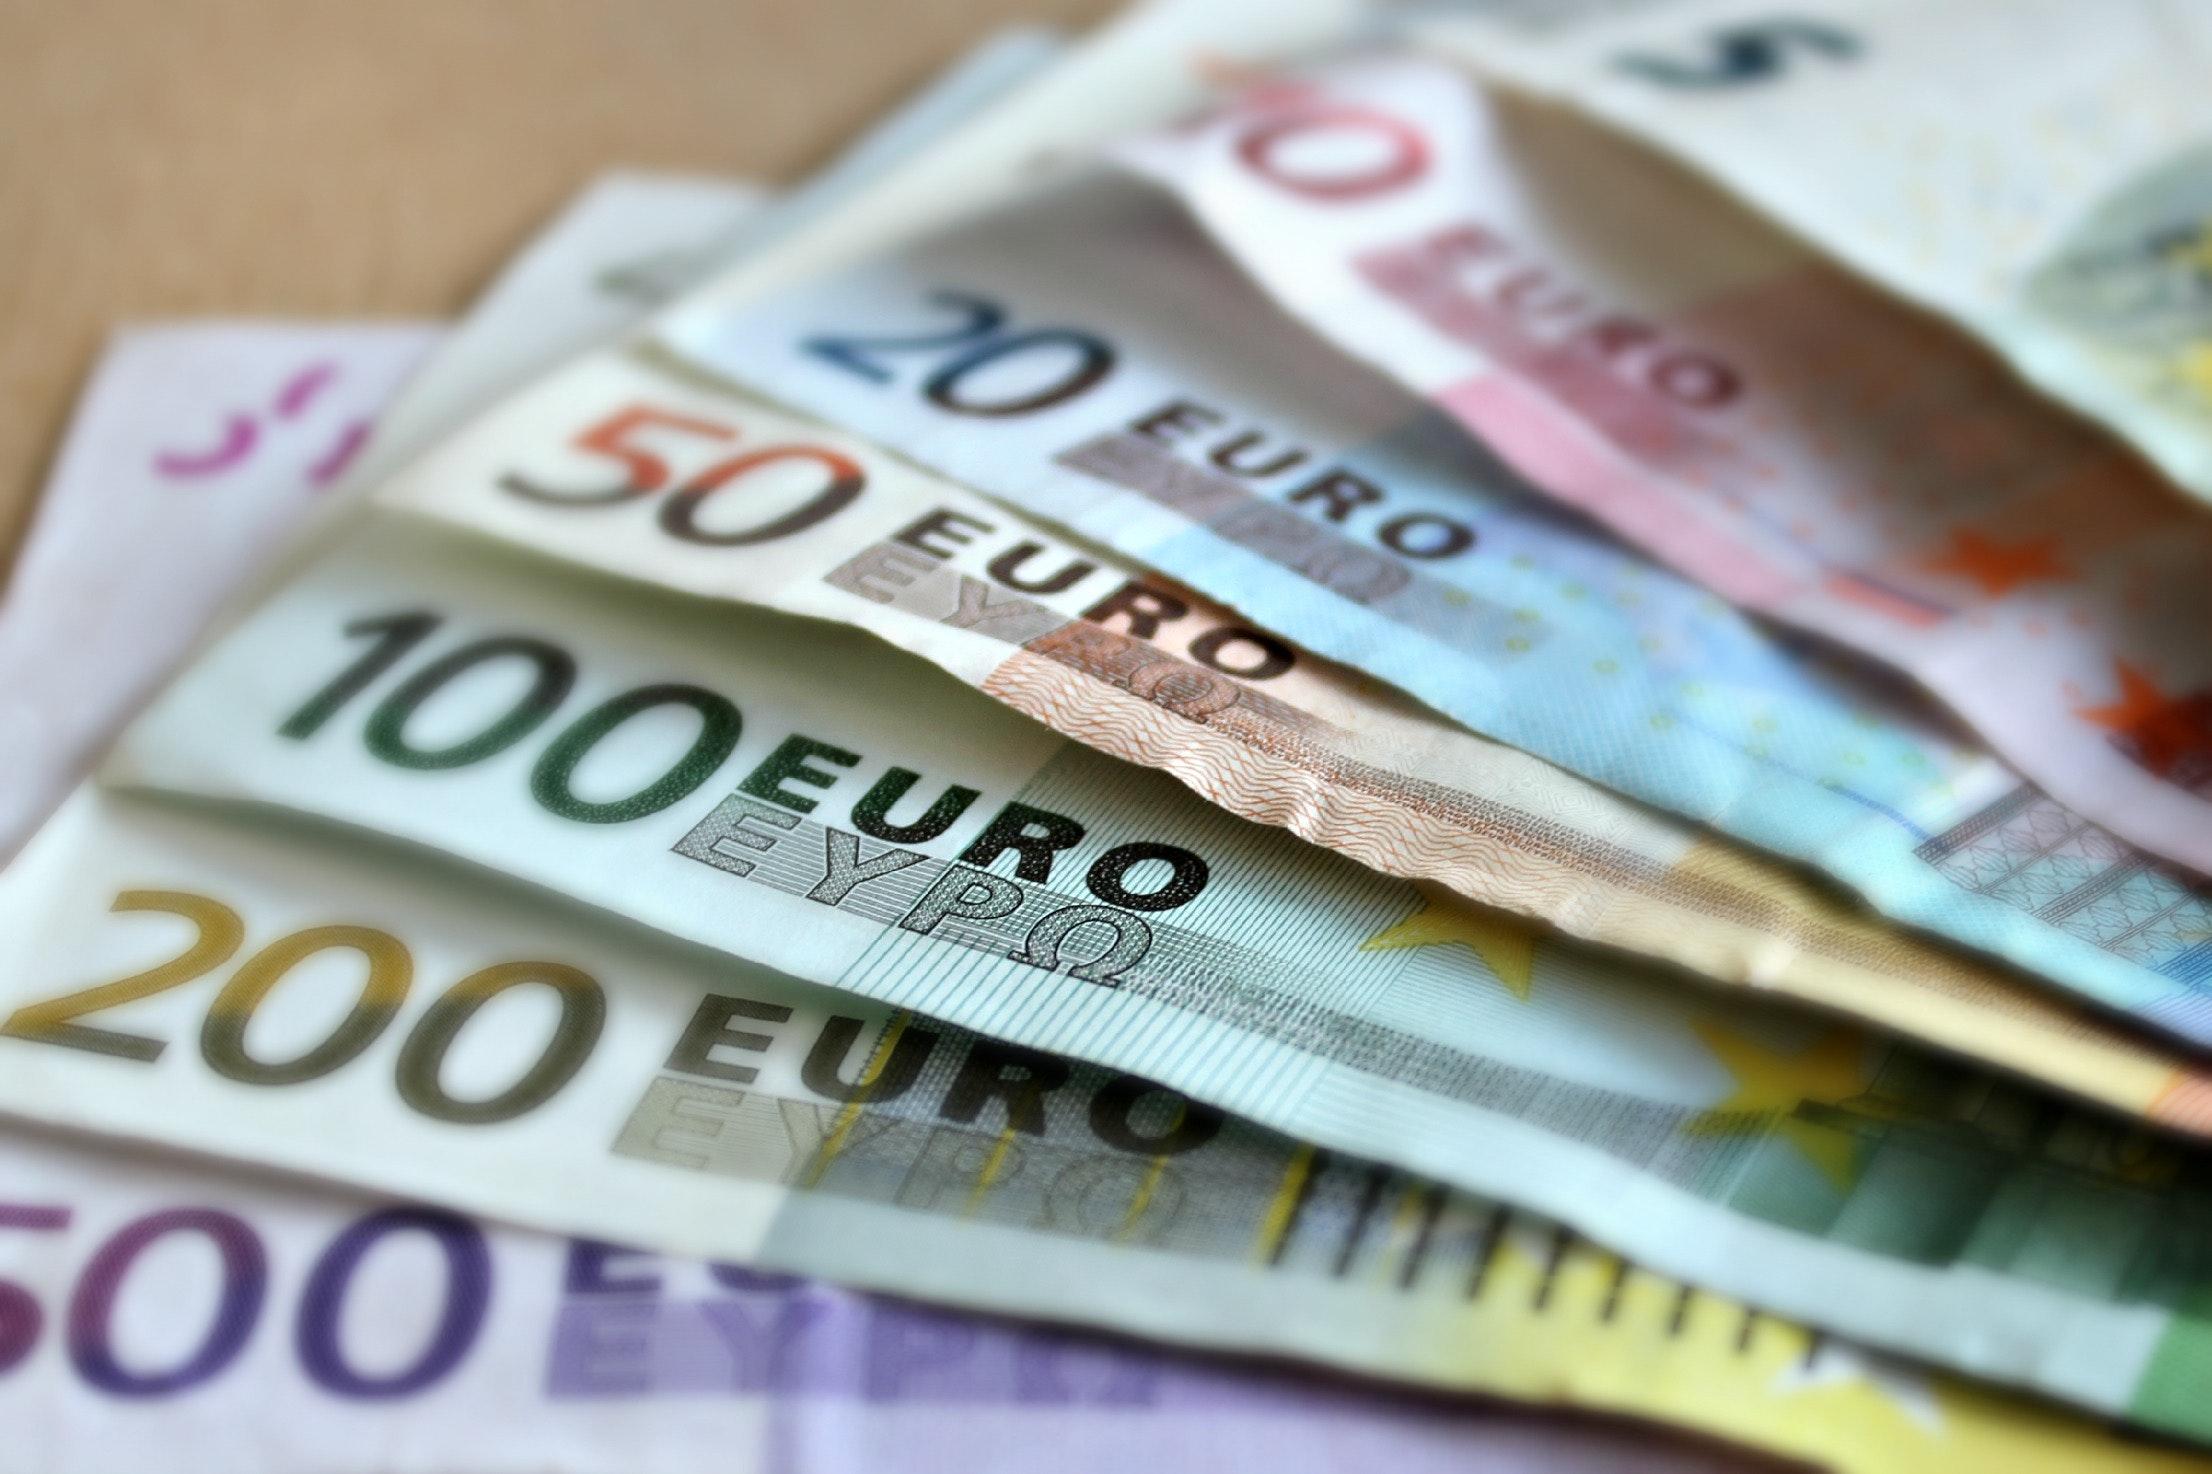 bank-note-euro-bills-paper-money.jpeg